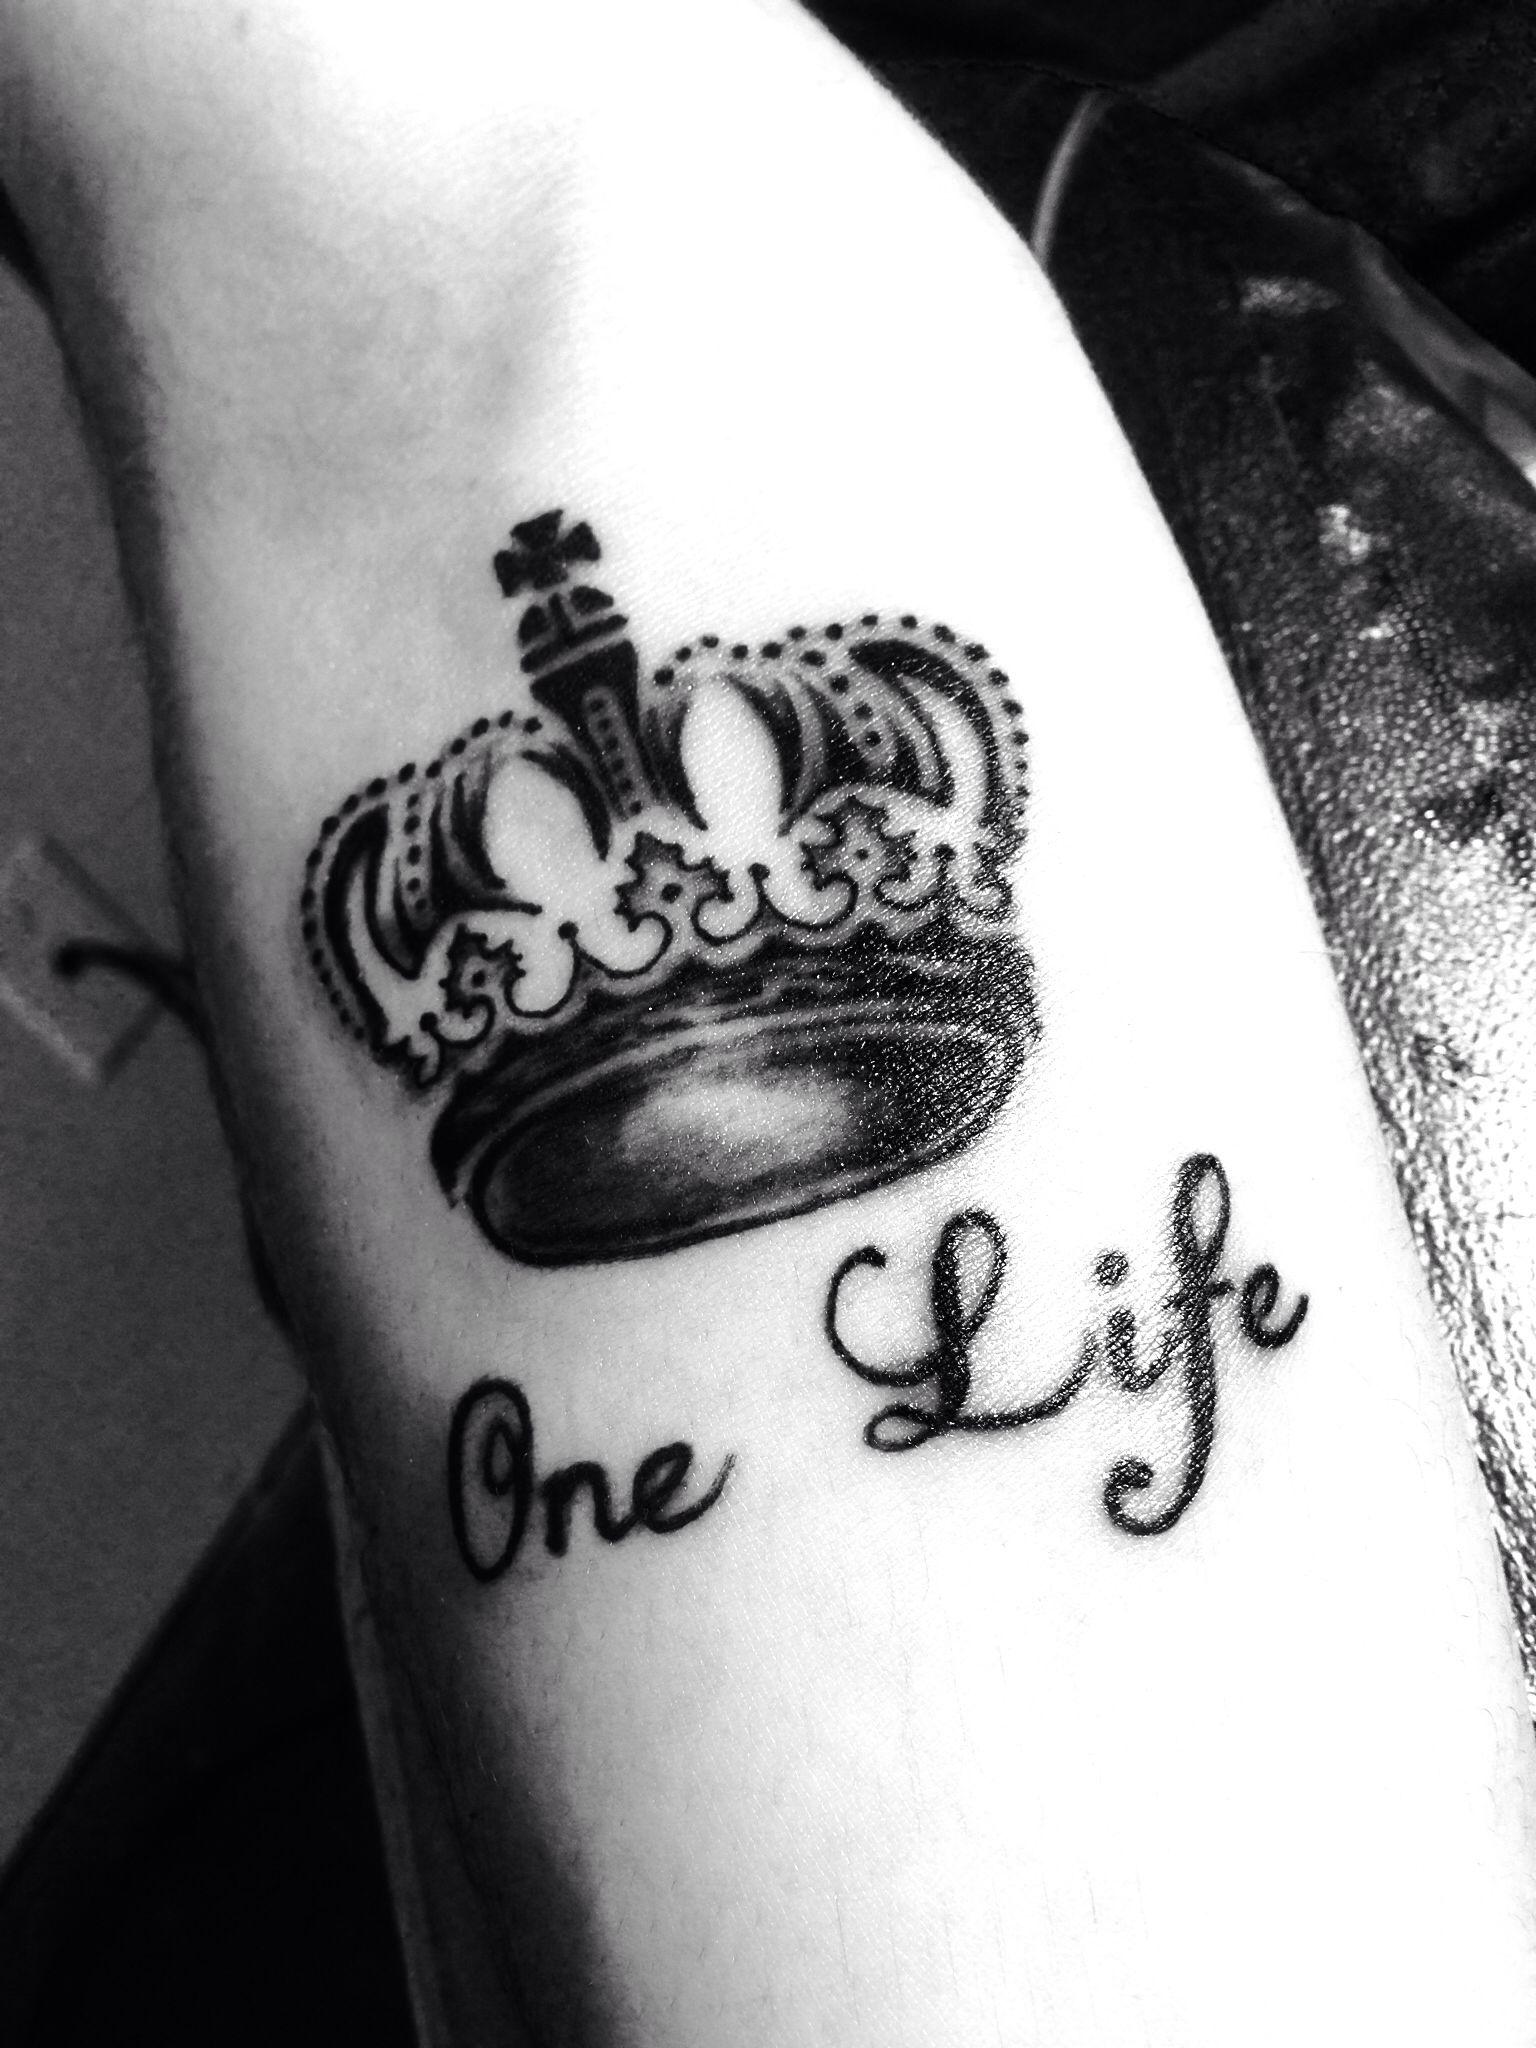 one life kings crown tattoo tattoos pinterest king crown tattoo. Black Bedroom Furniture Sets. Home Design Ideas